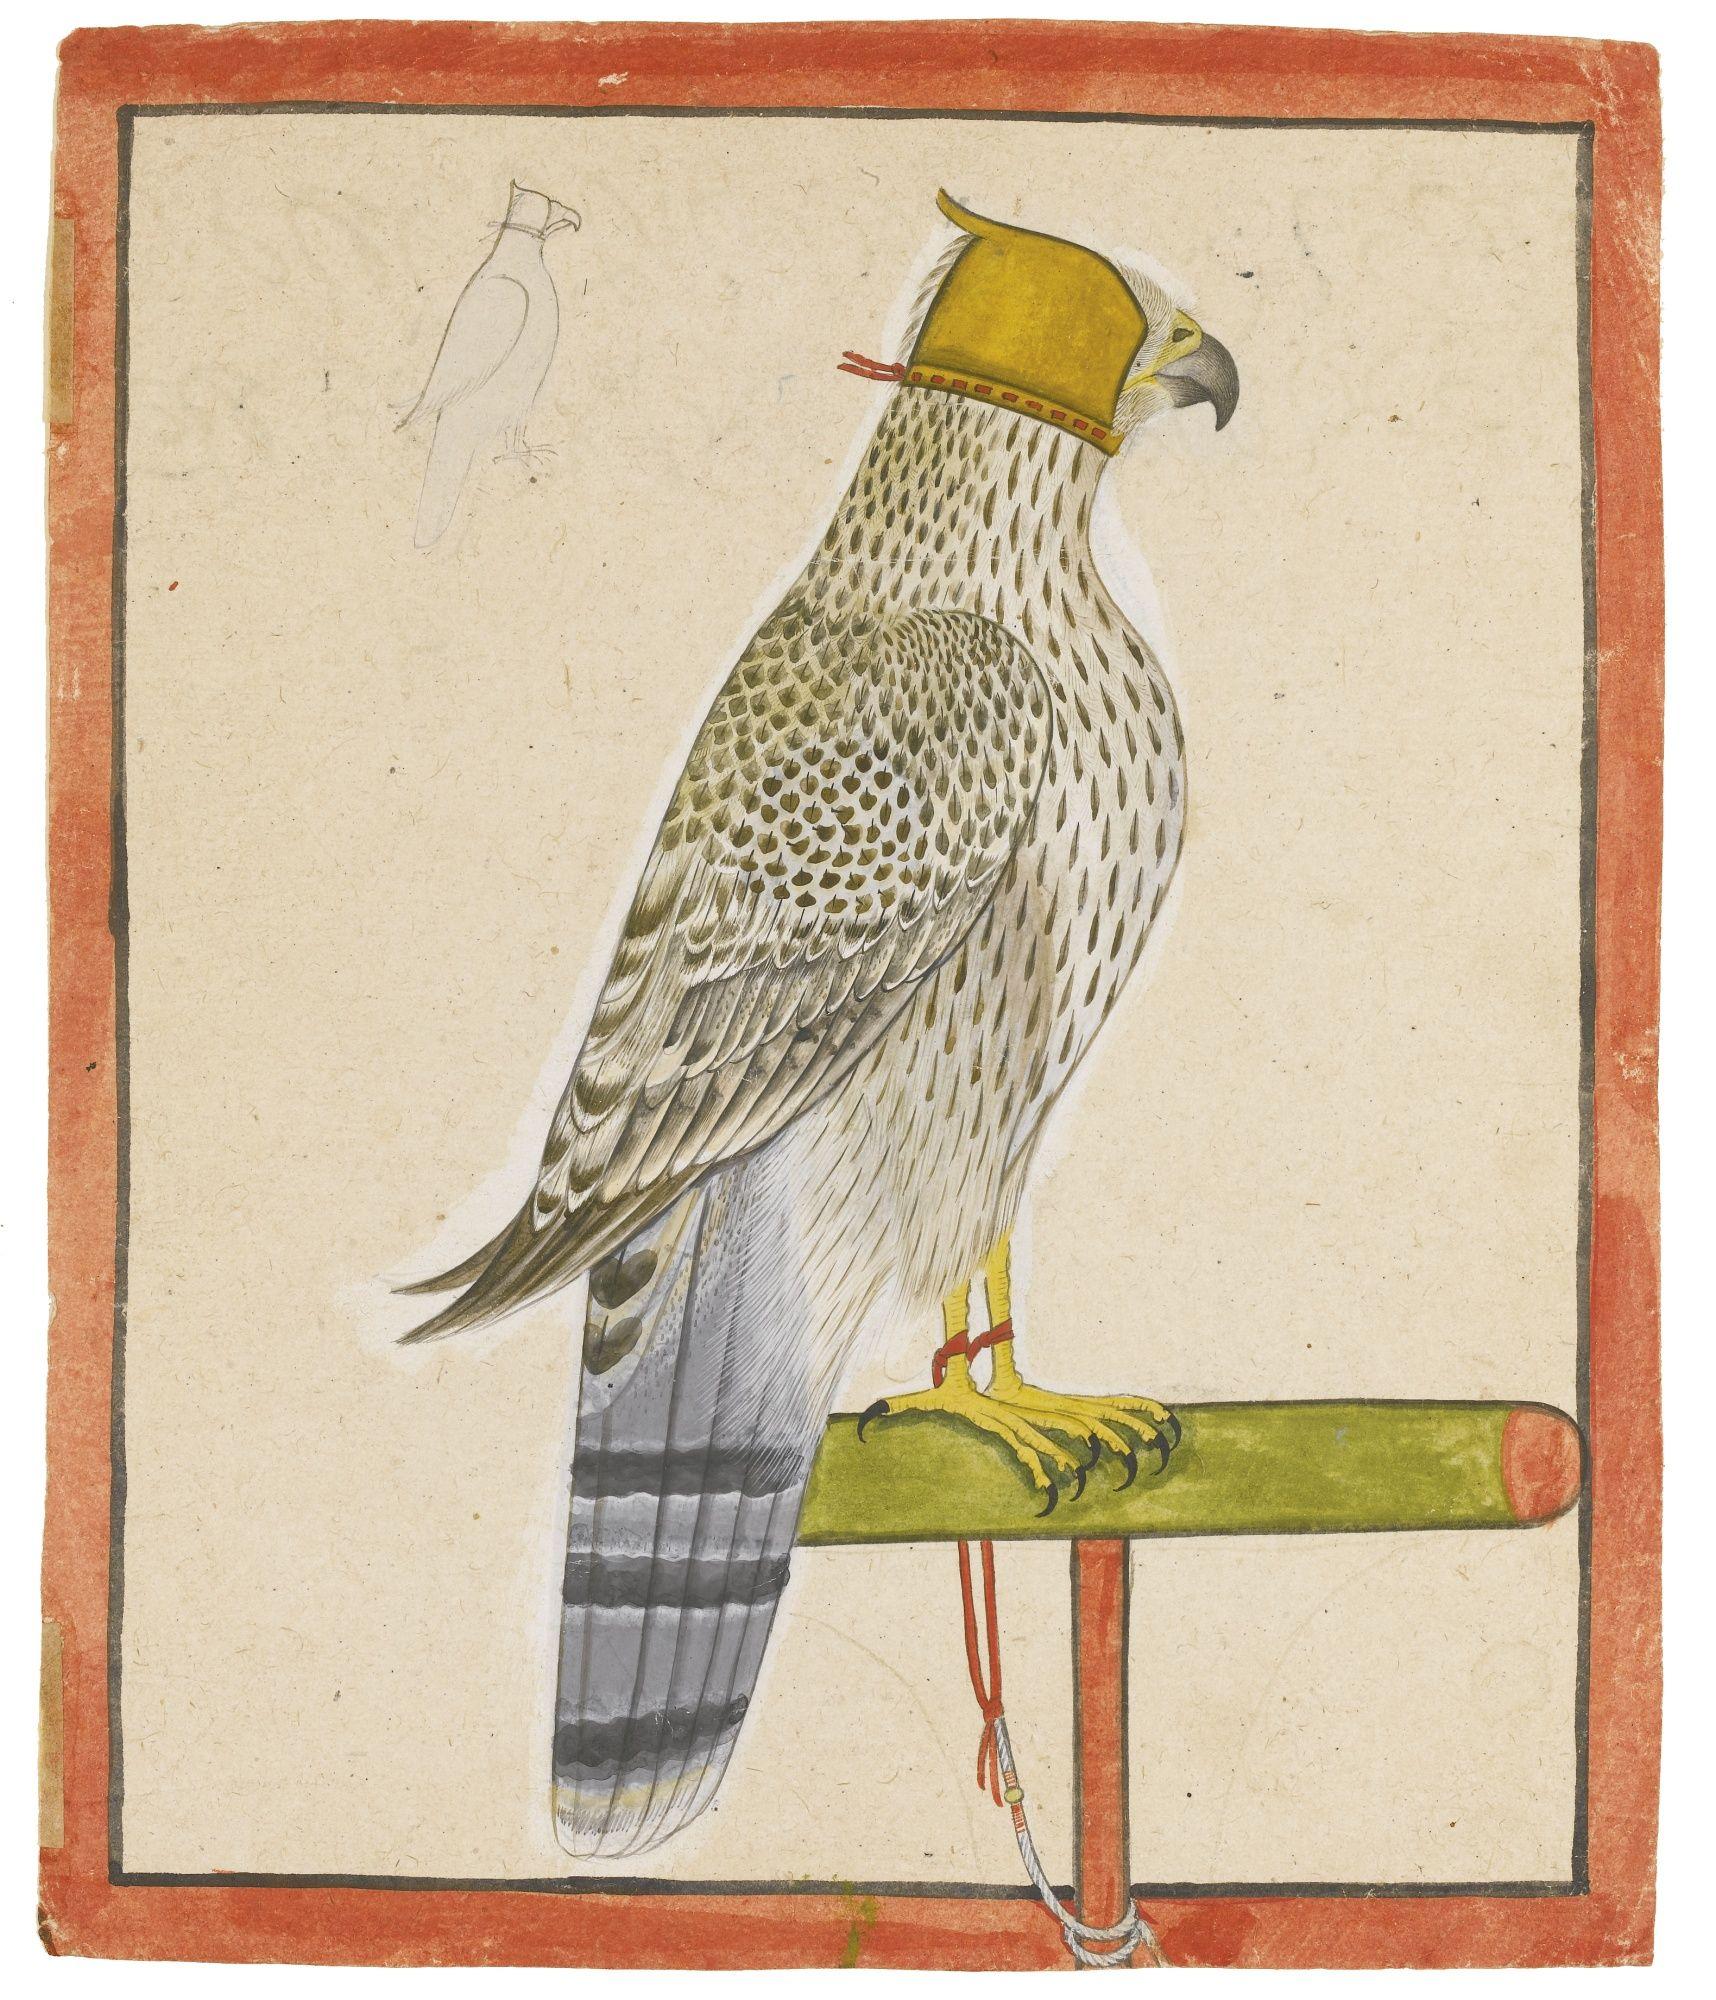 A favourite falcon of Raja Balwant Singh of Jasrota, attributed to Nainsukh of Guler, Jasrota, dated 1737